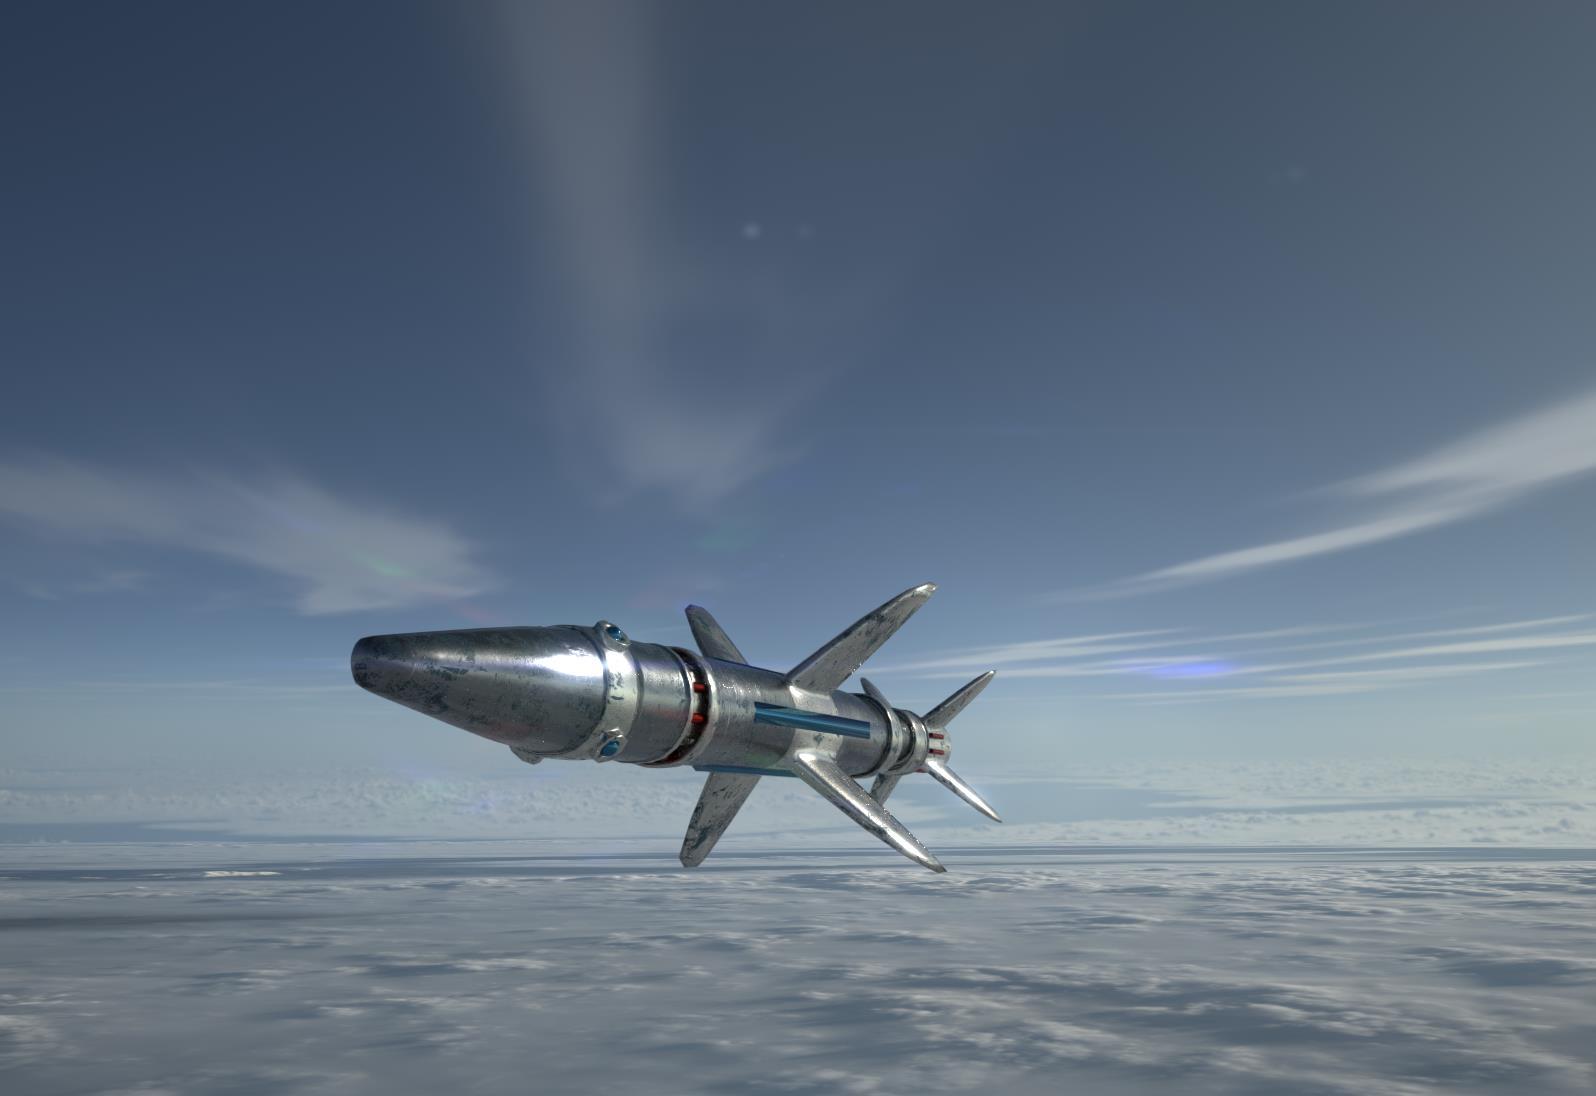 missile 3.jpg